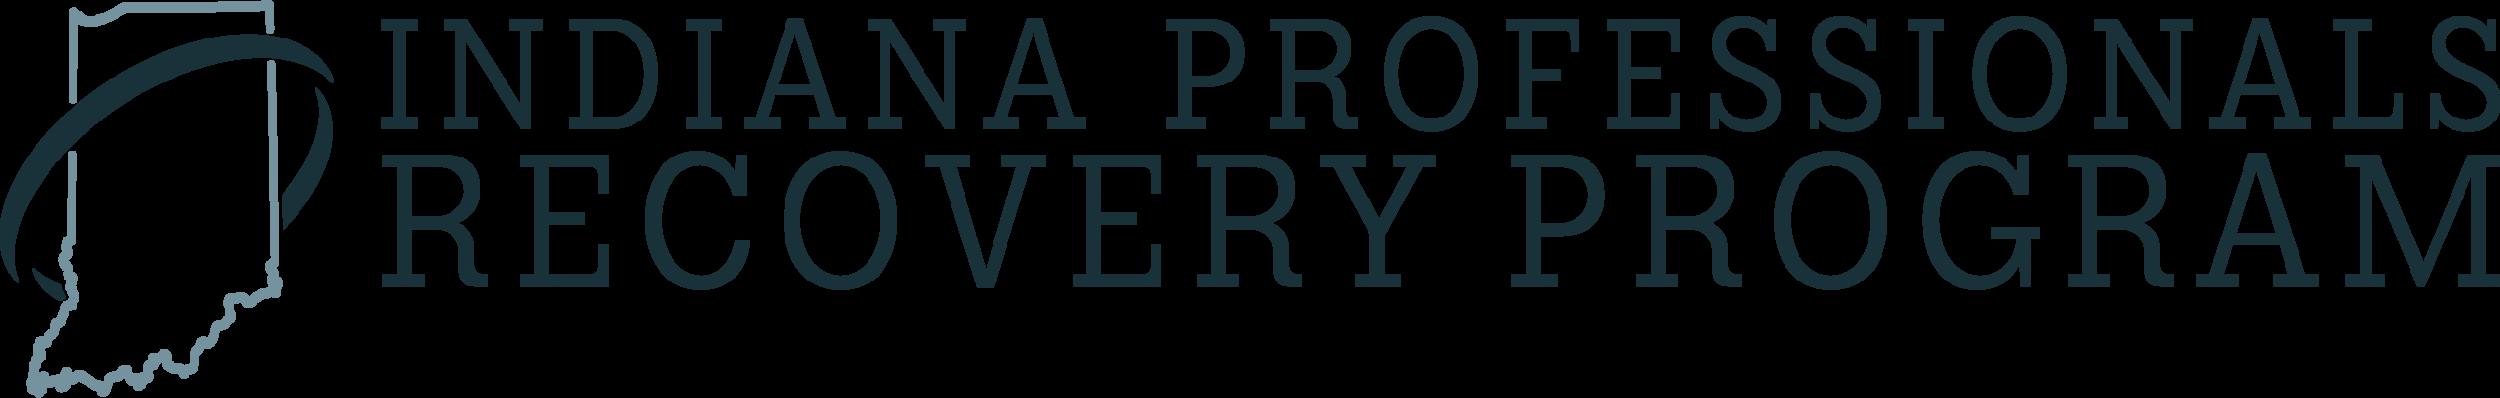 prp_logo_horizontal_lockup_final.png